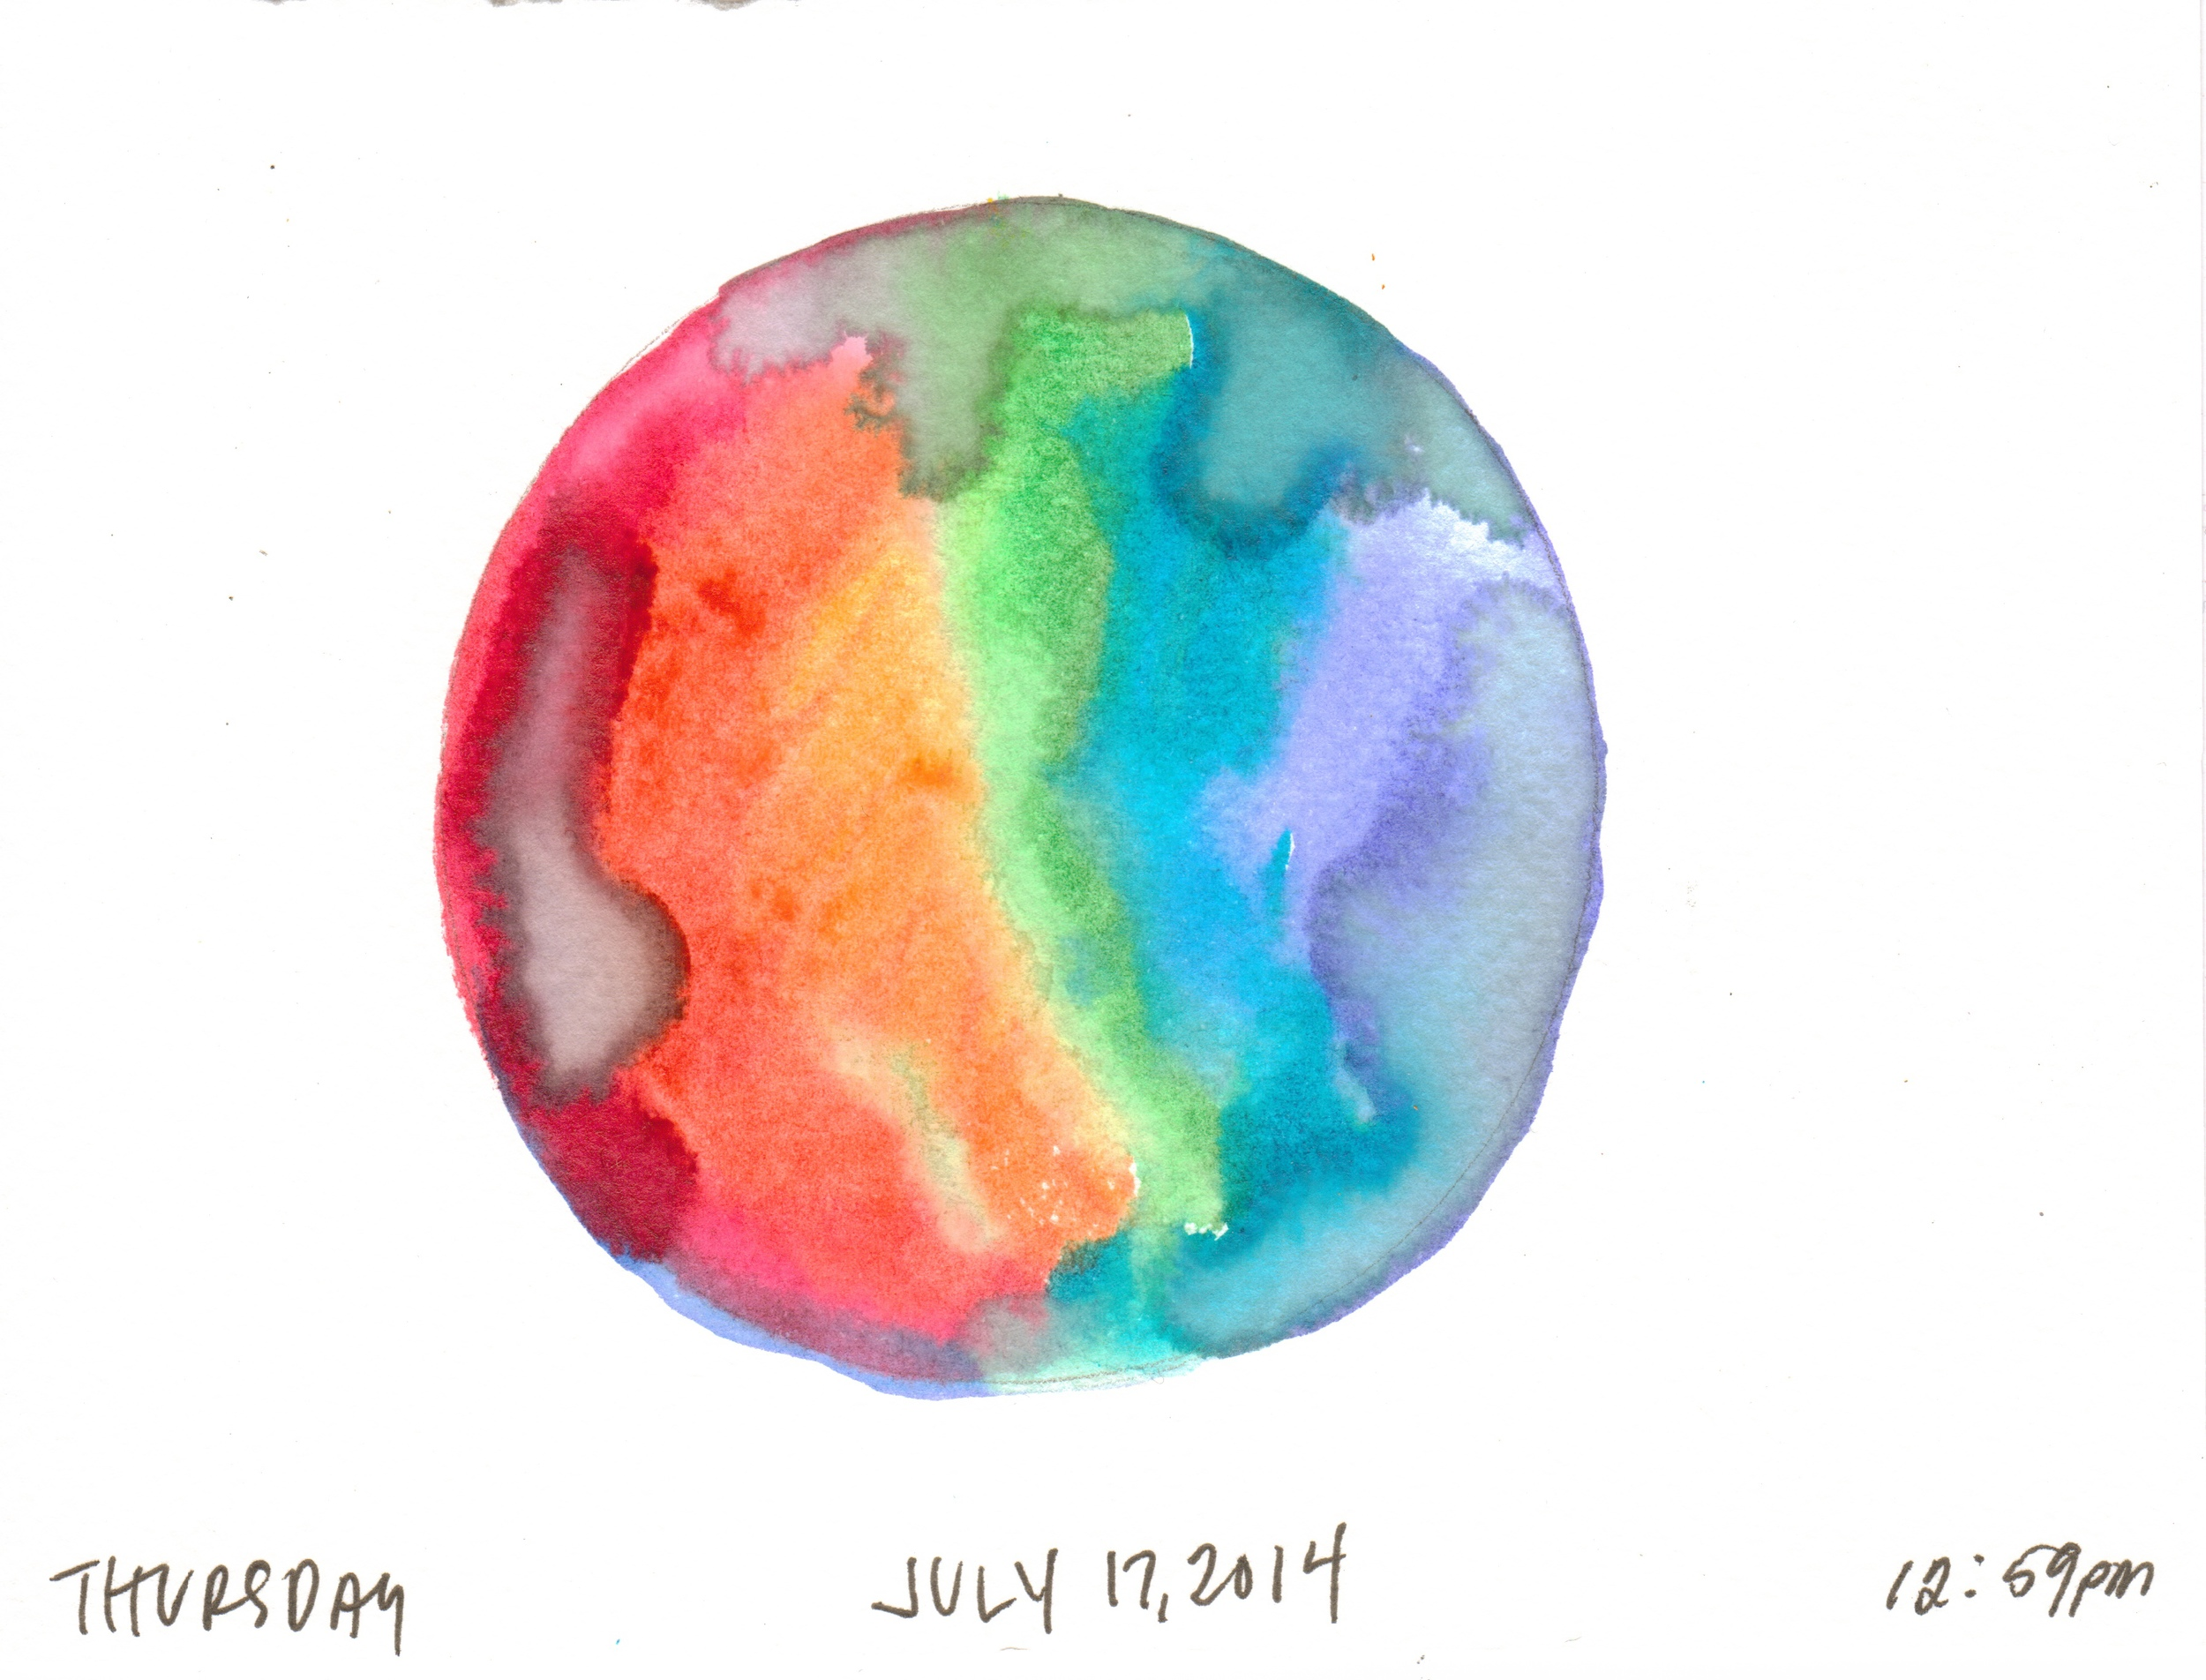 07.17.14